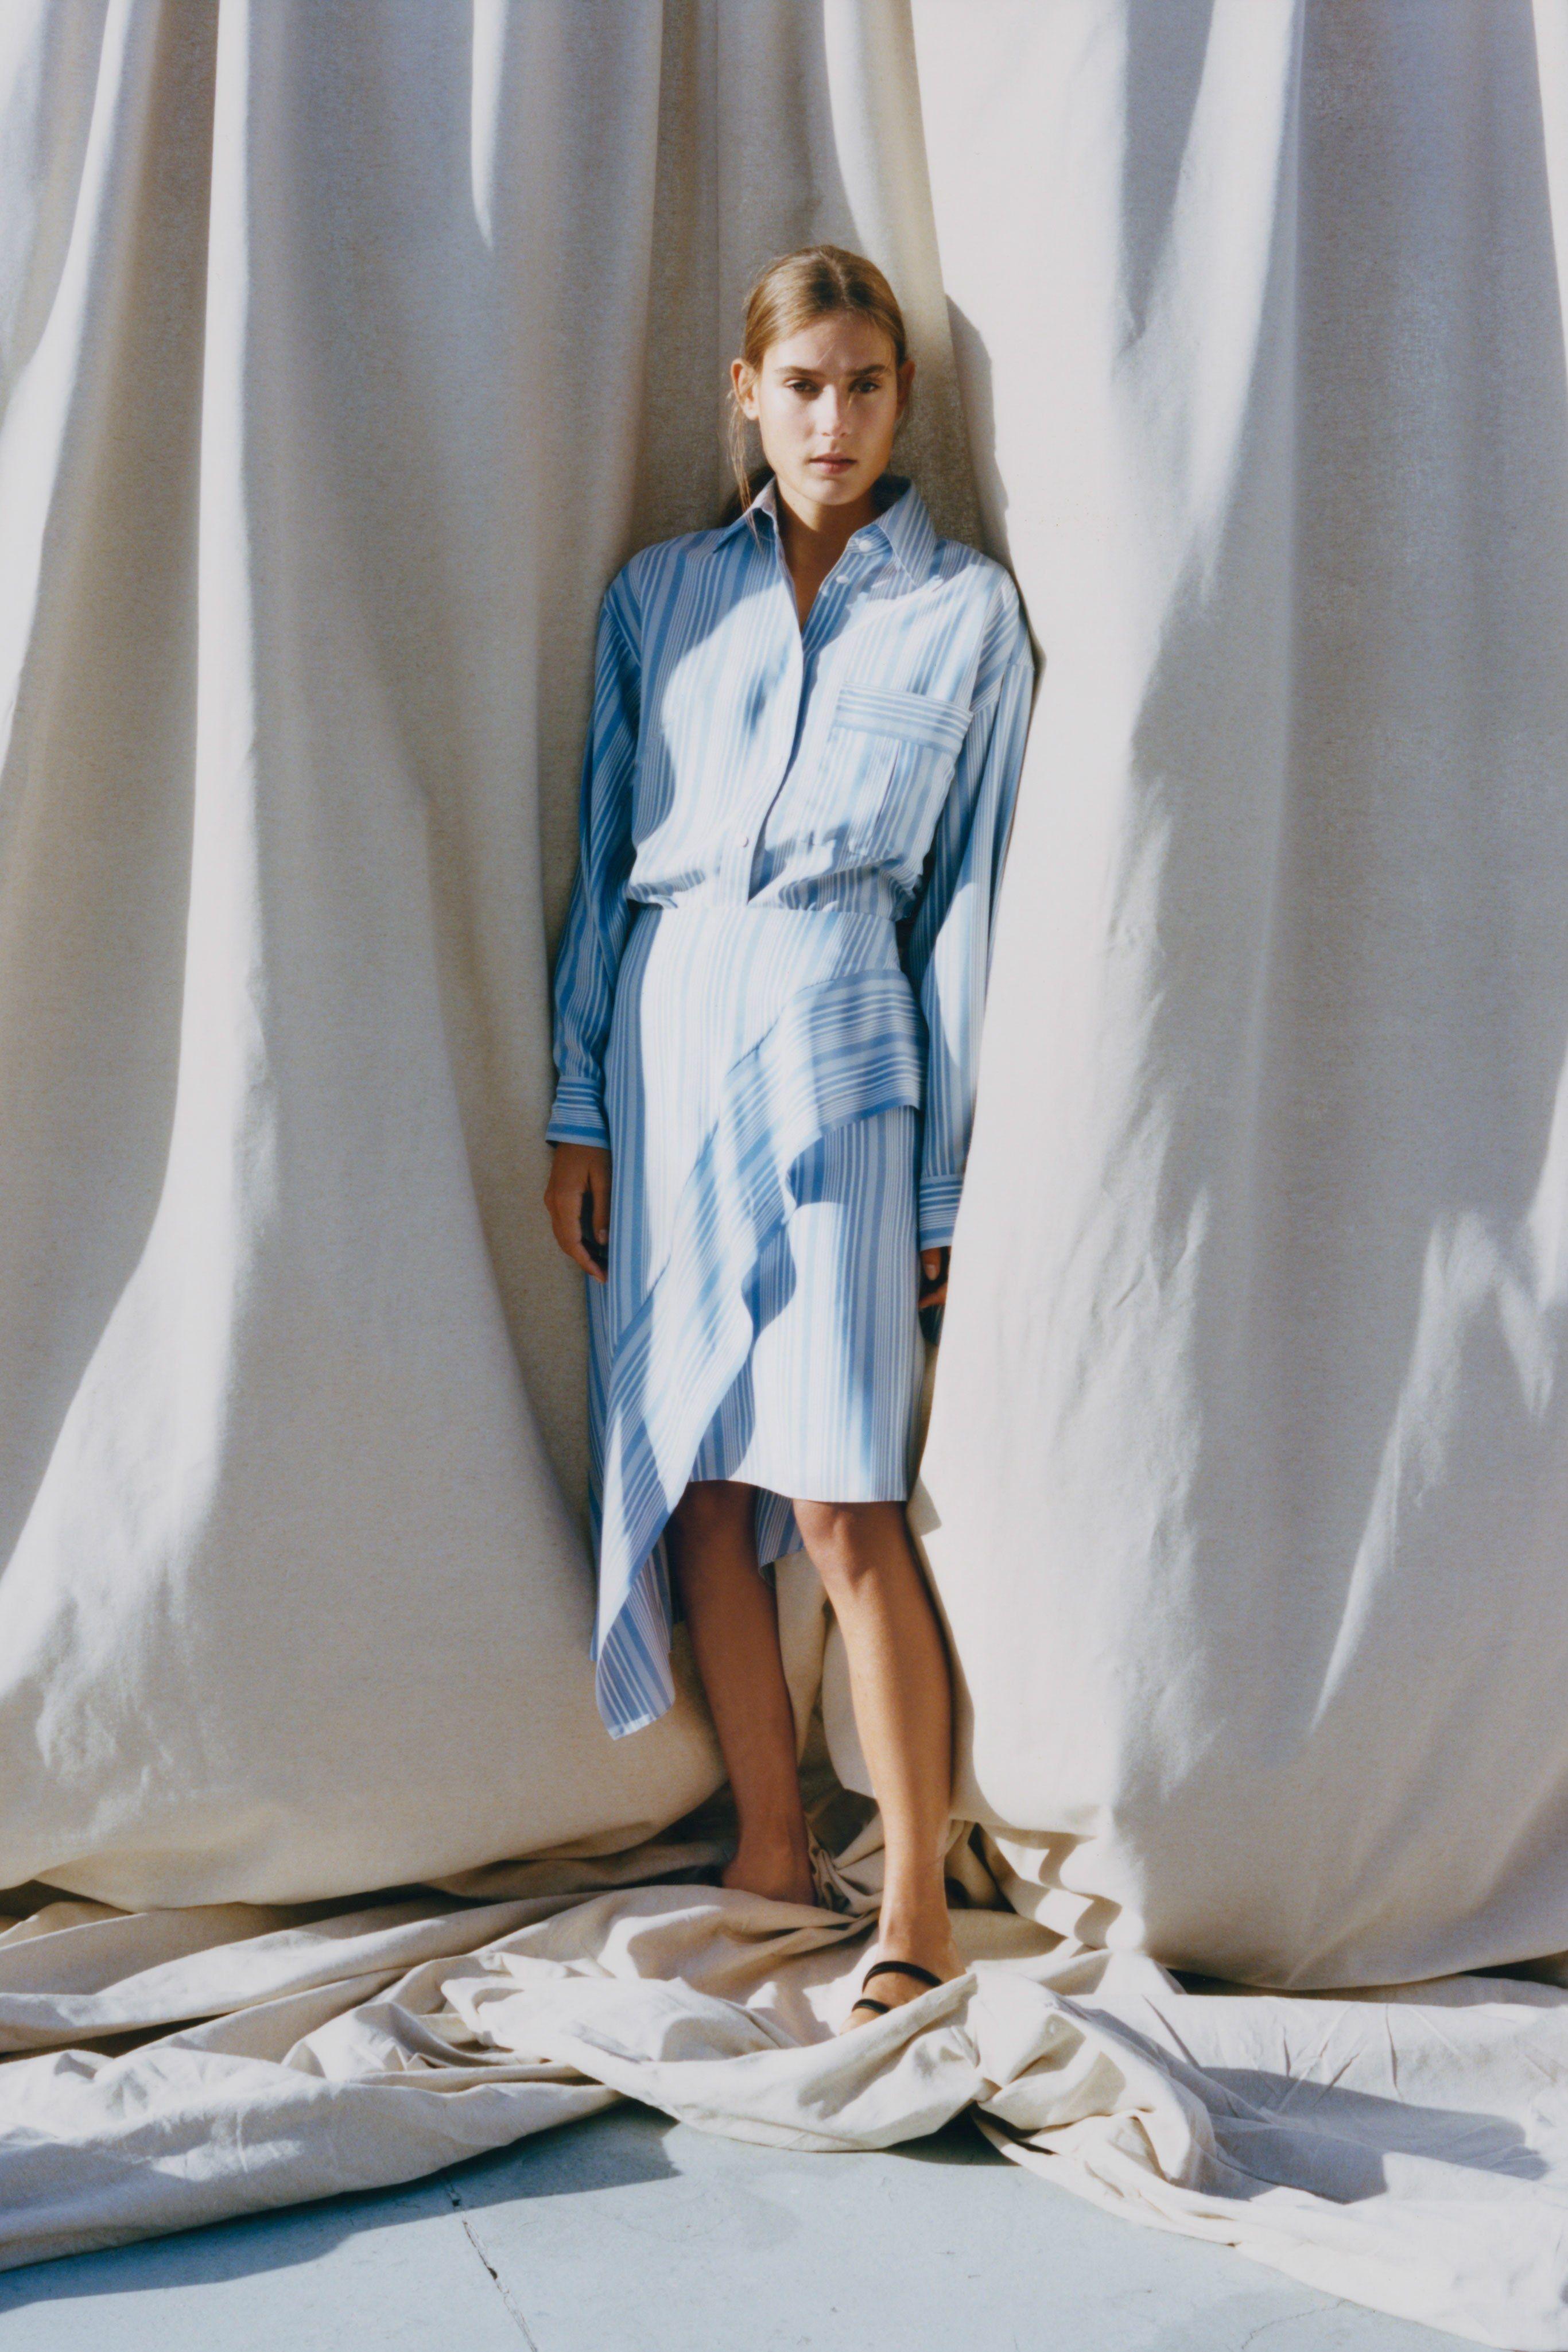 86ed7ad70ea90 Nina Ricci Spring 2019 Ready-to-Wear Fashion Show in 2019 | Simple ...